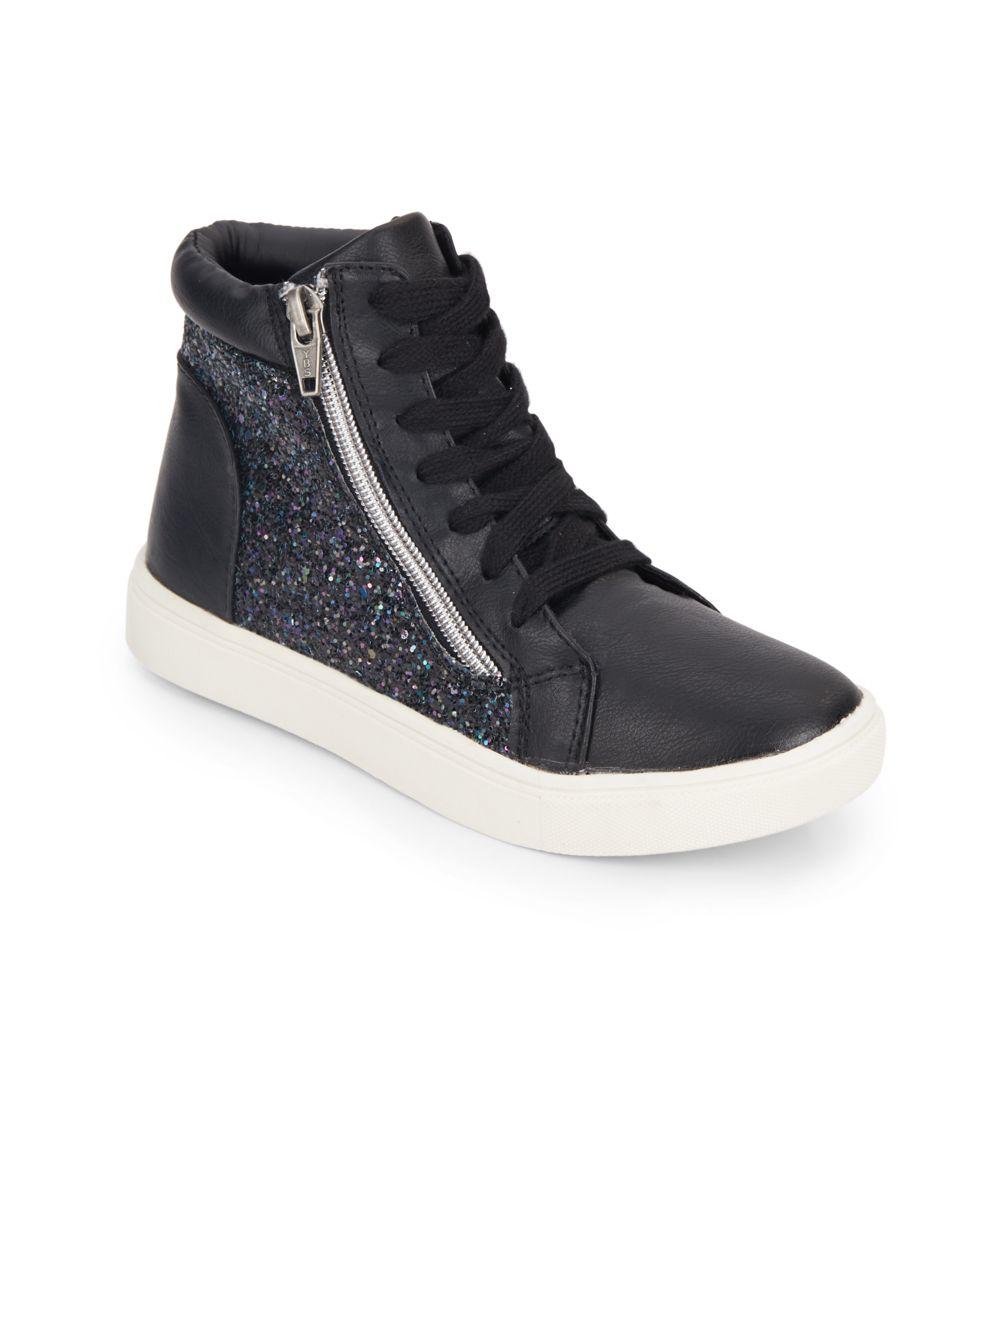 girl black high top sneakers Shop